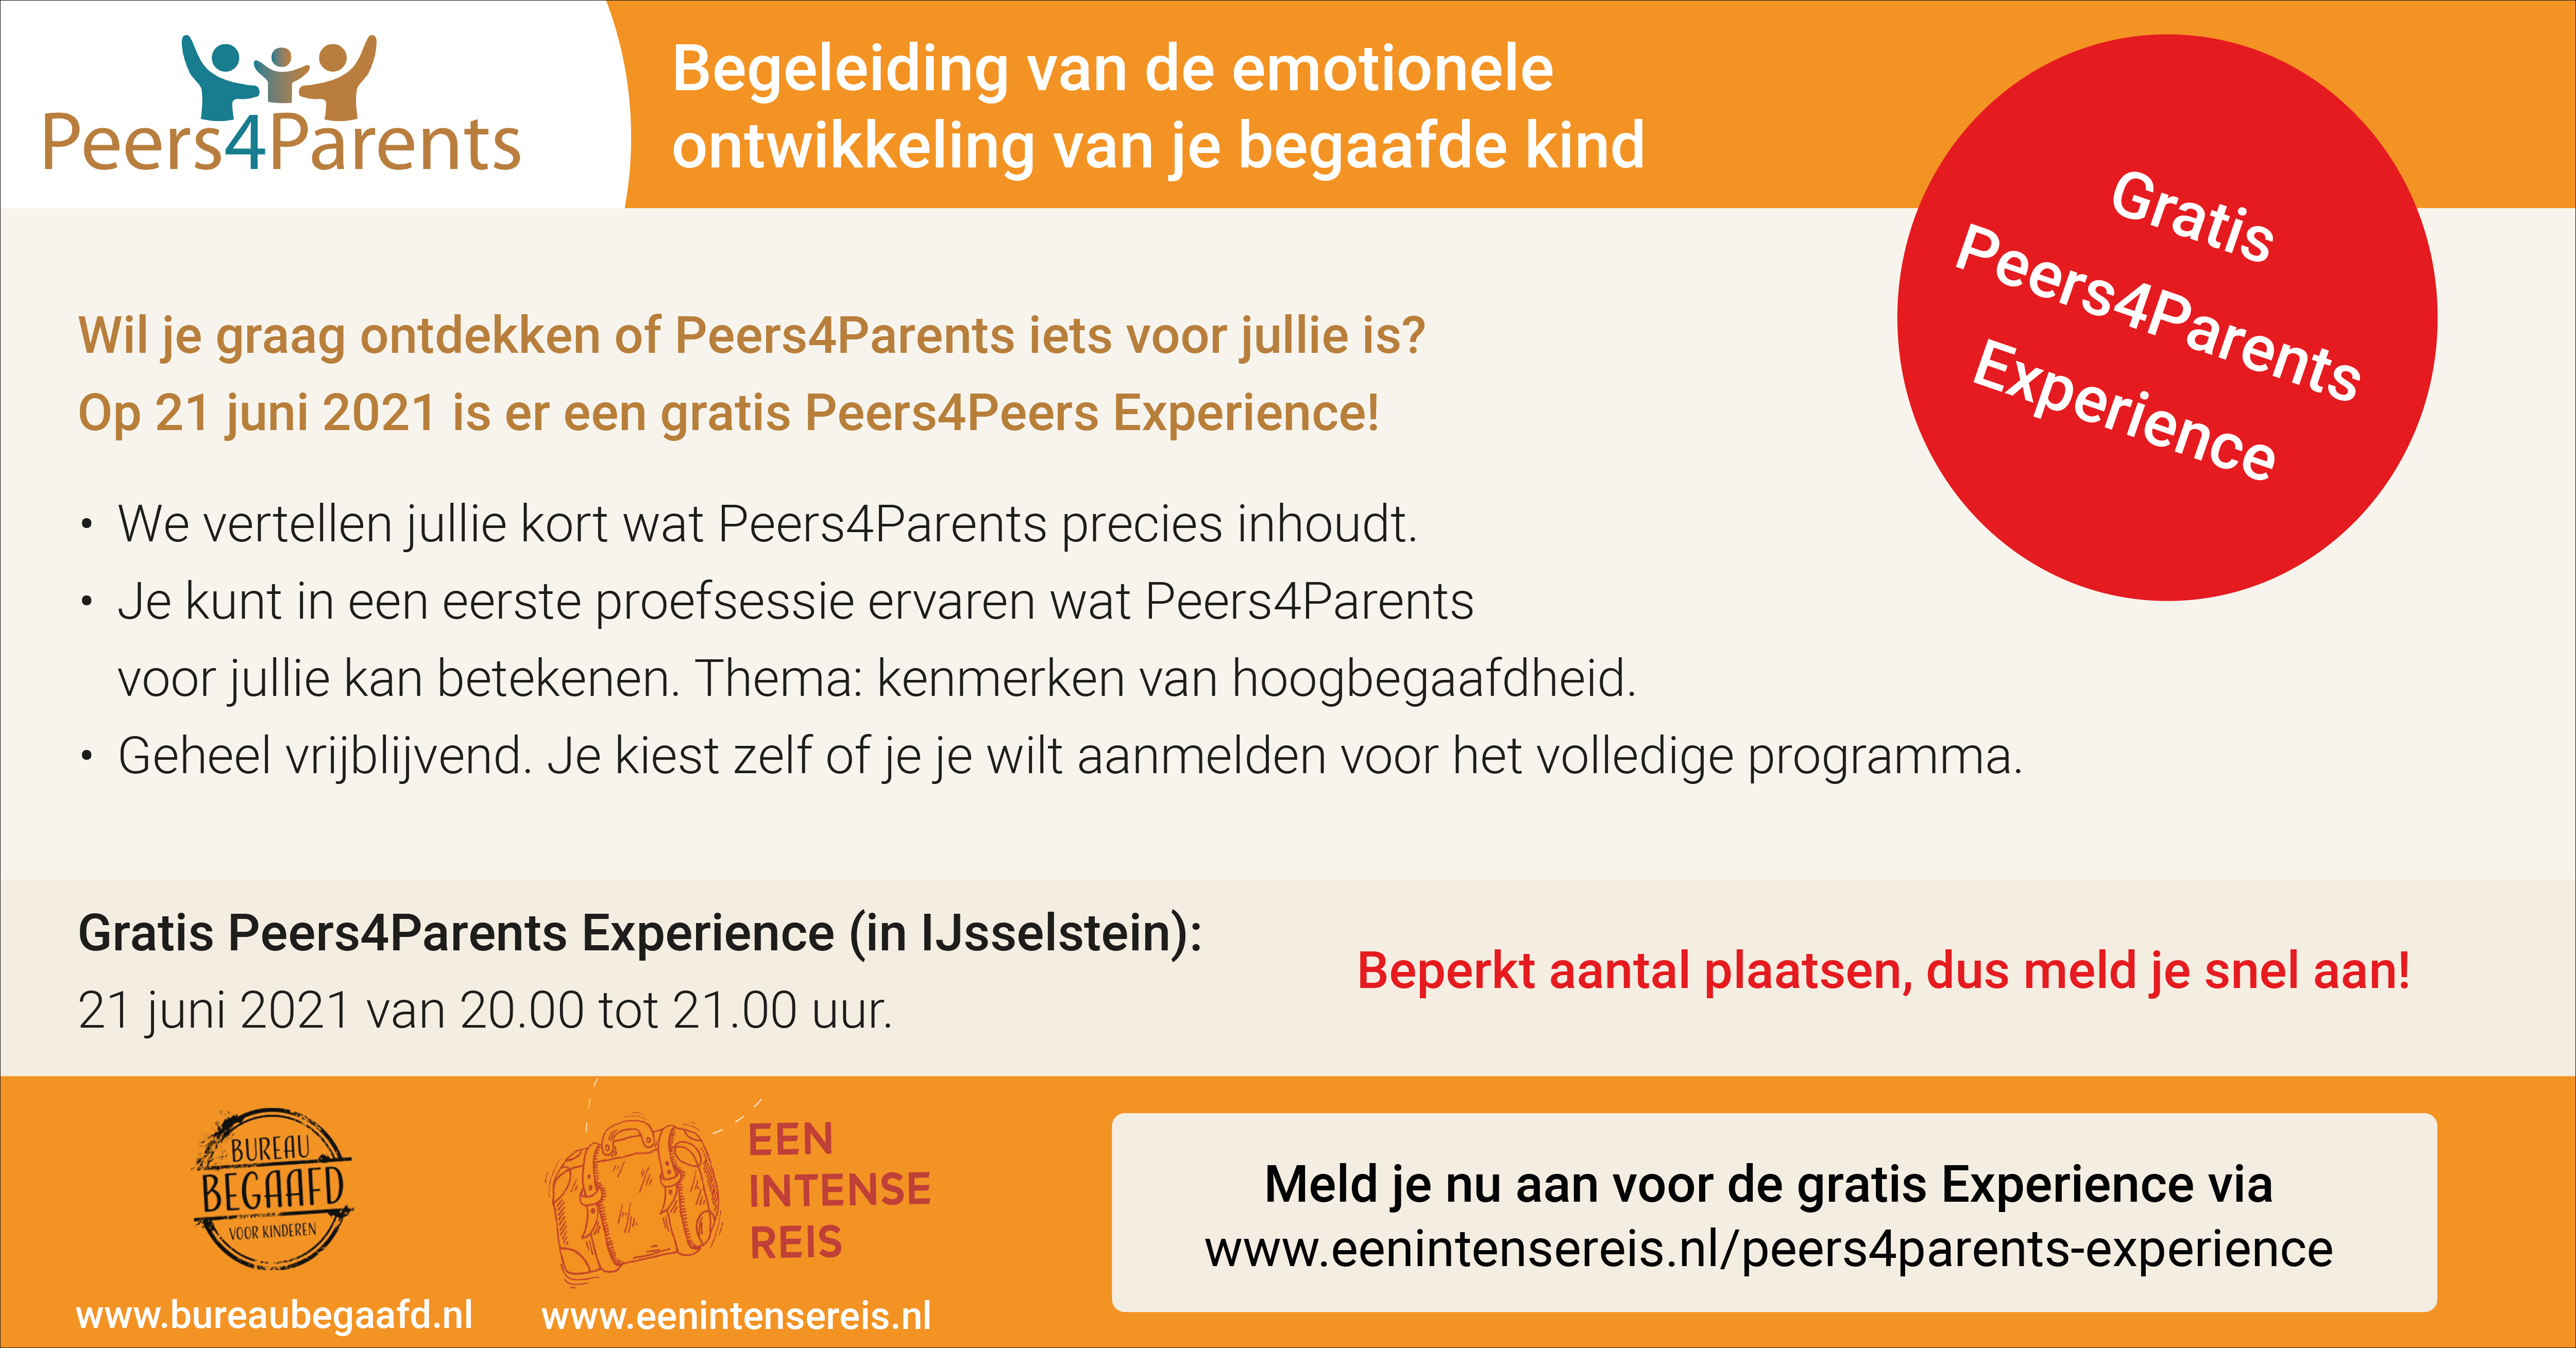 Peers4Parents Experience